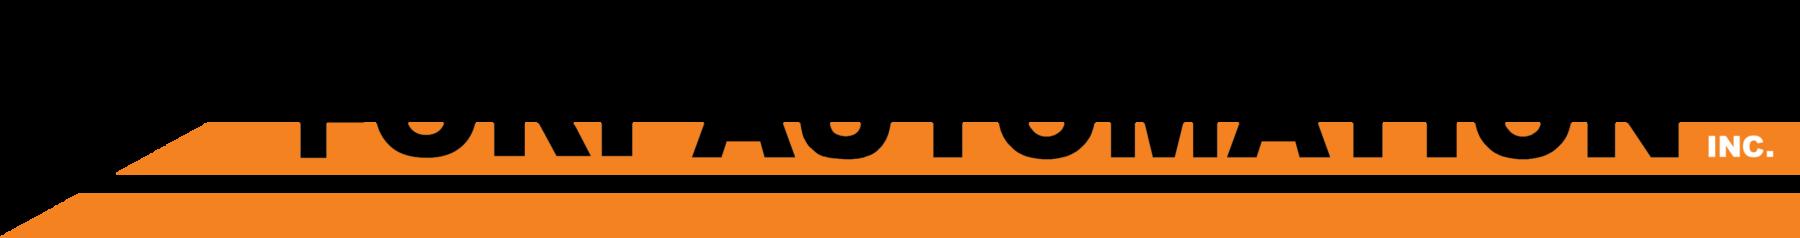 Fori Automation logo